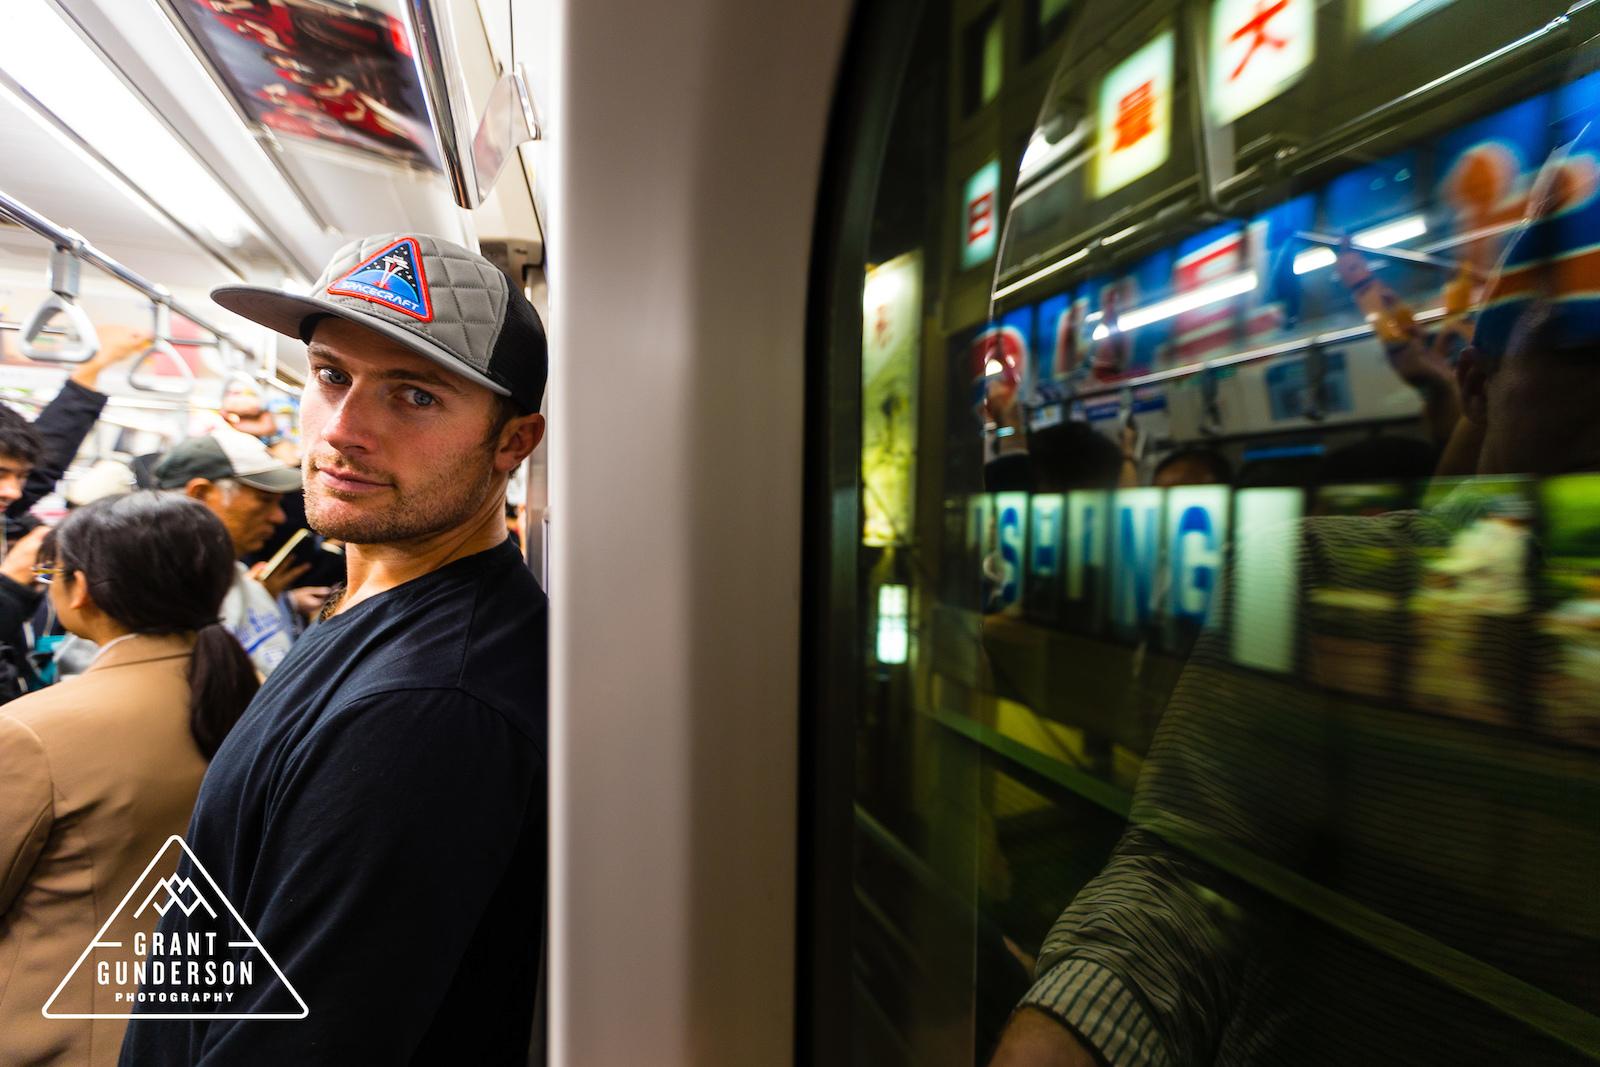 KC Deane in the Tokyo Subaway